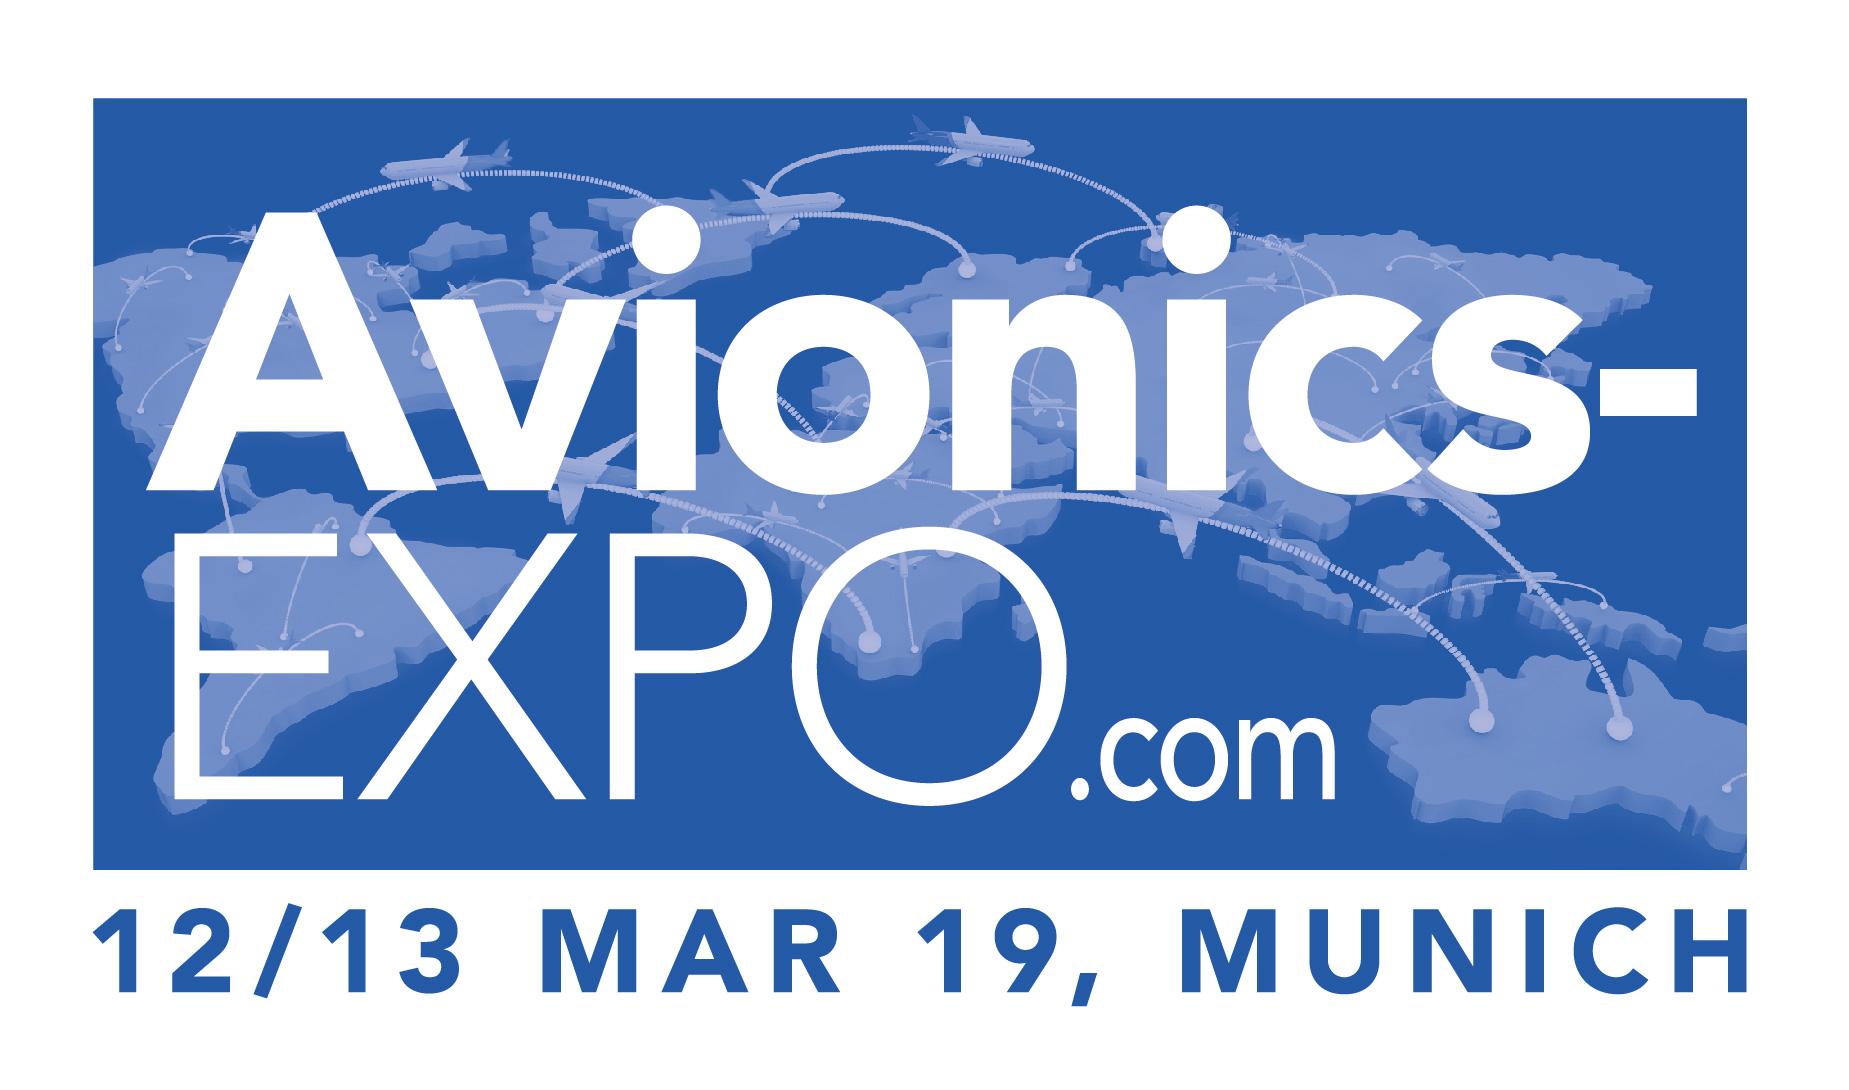 Avionics Expo